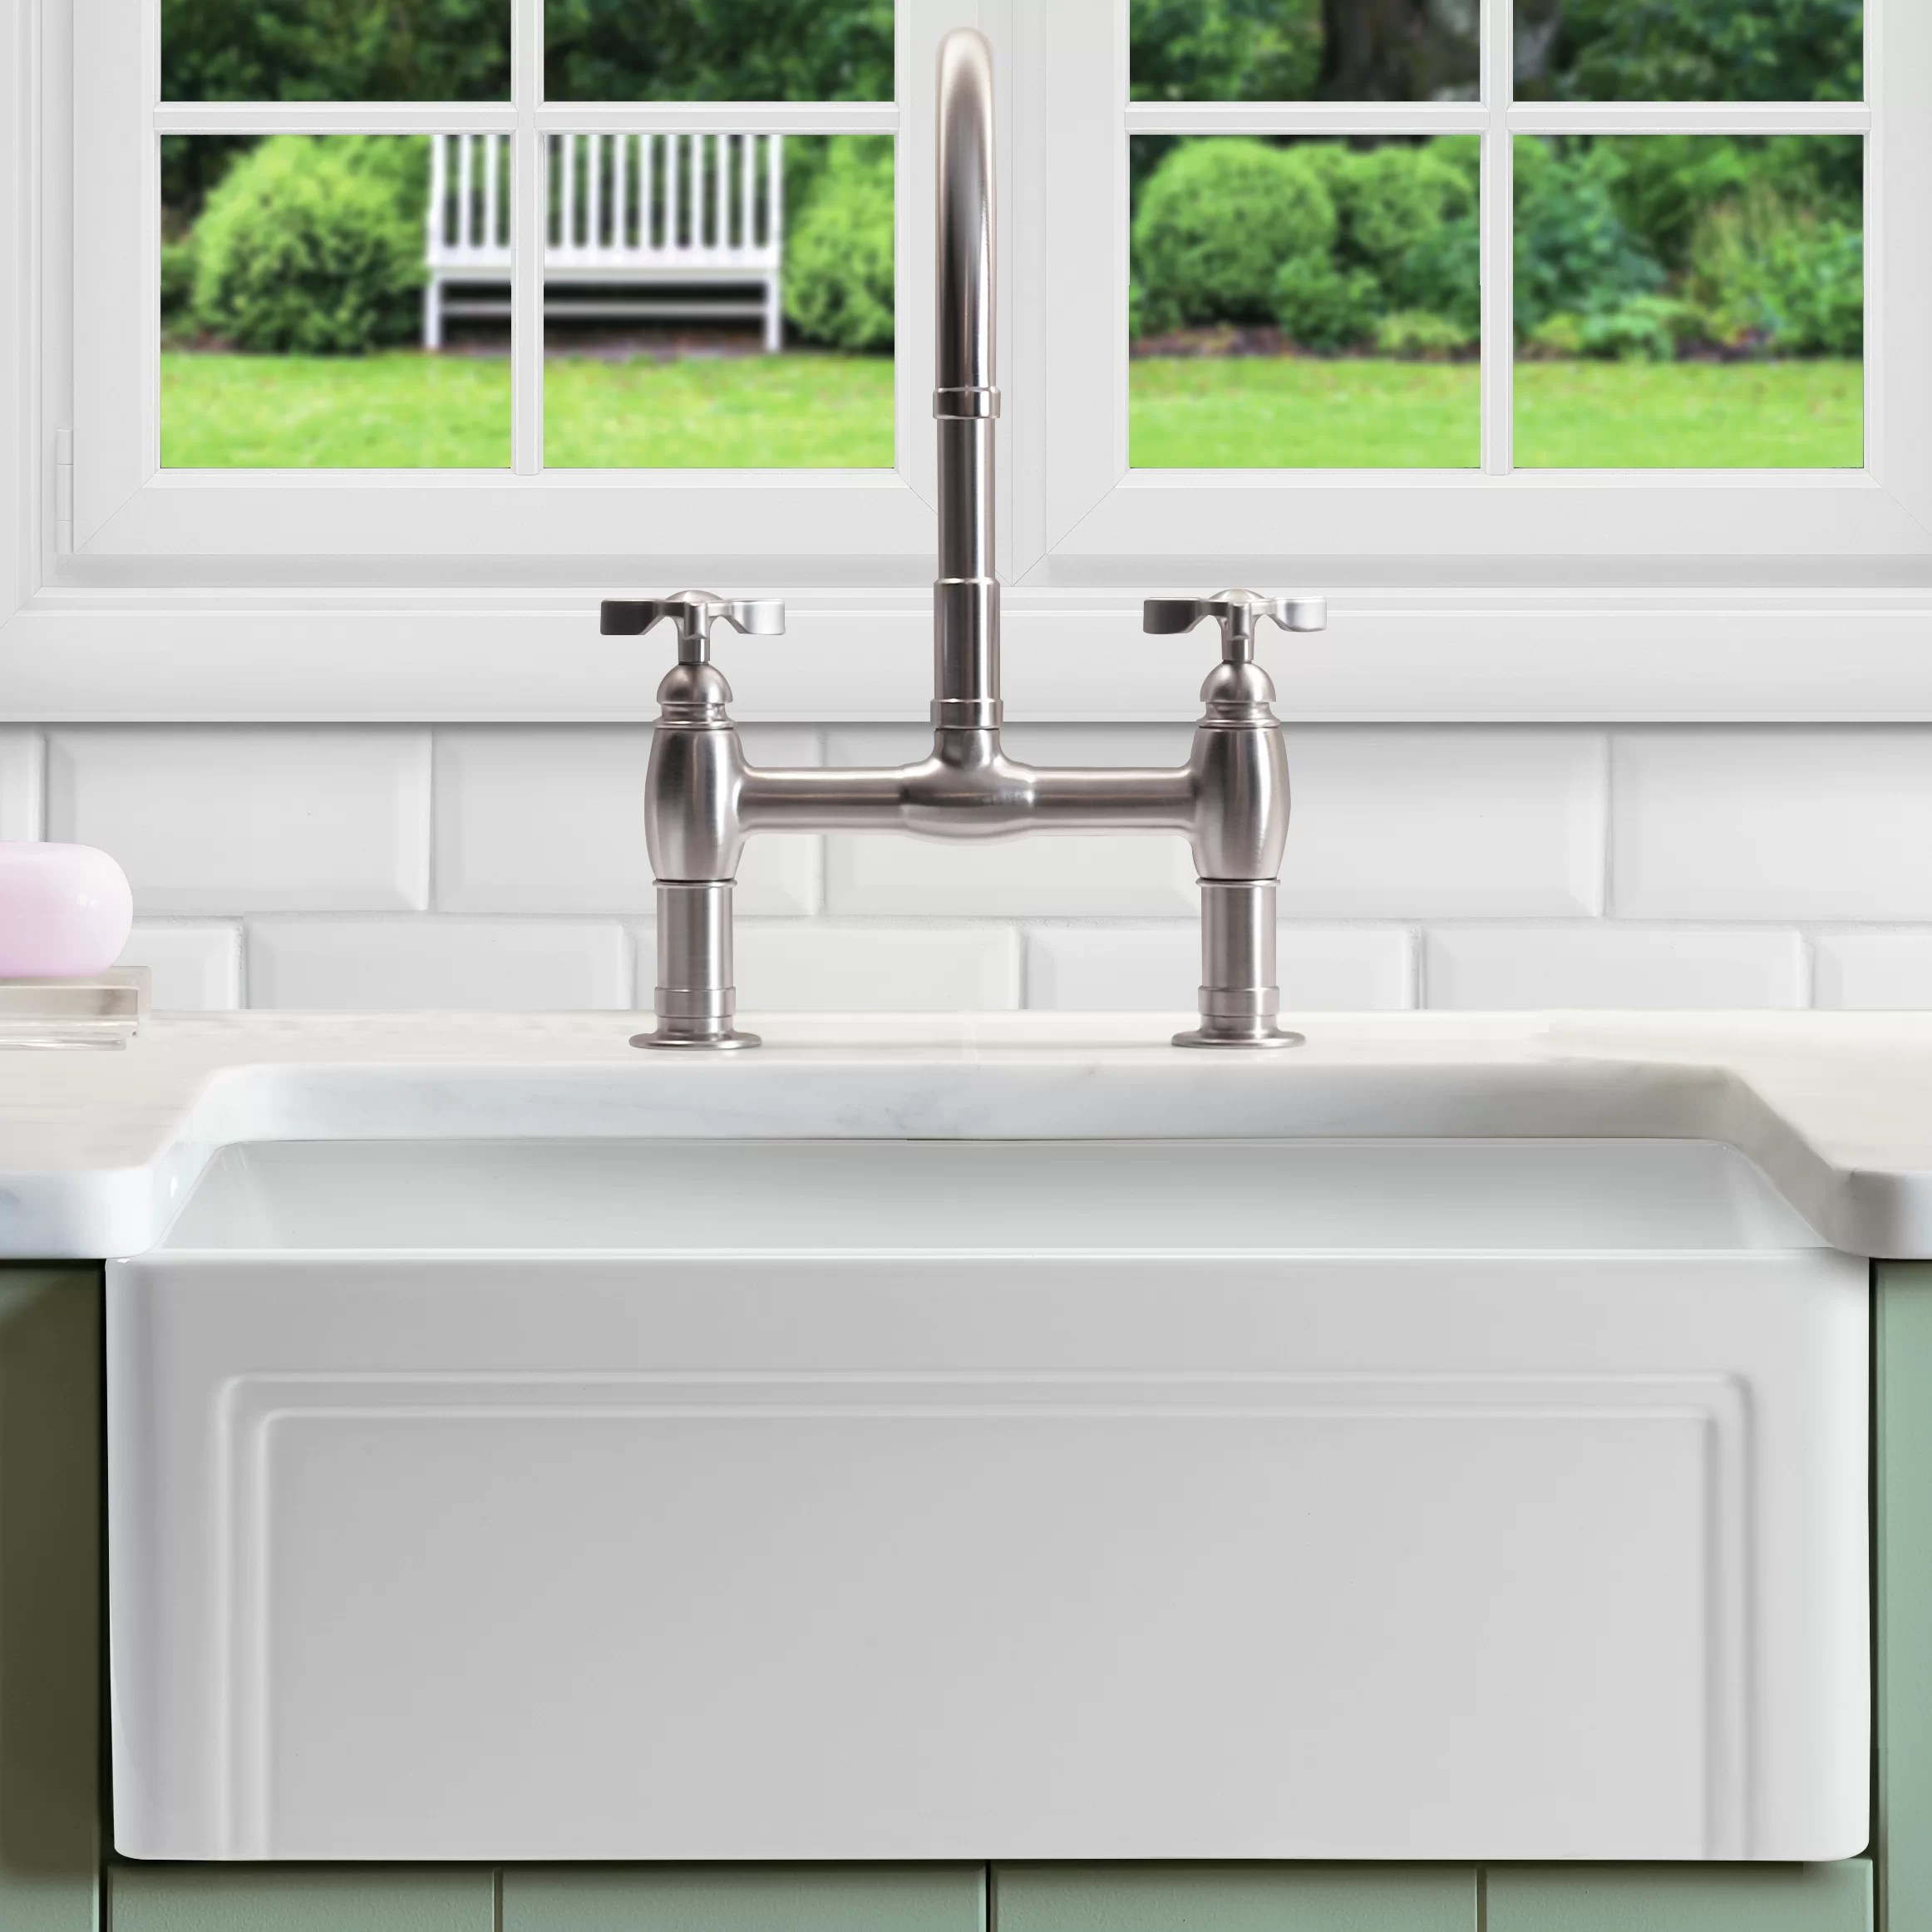 33 l x 18 w double basin farmhouse kitchen sink